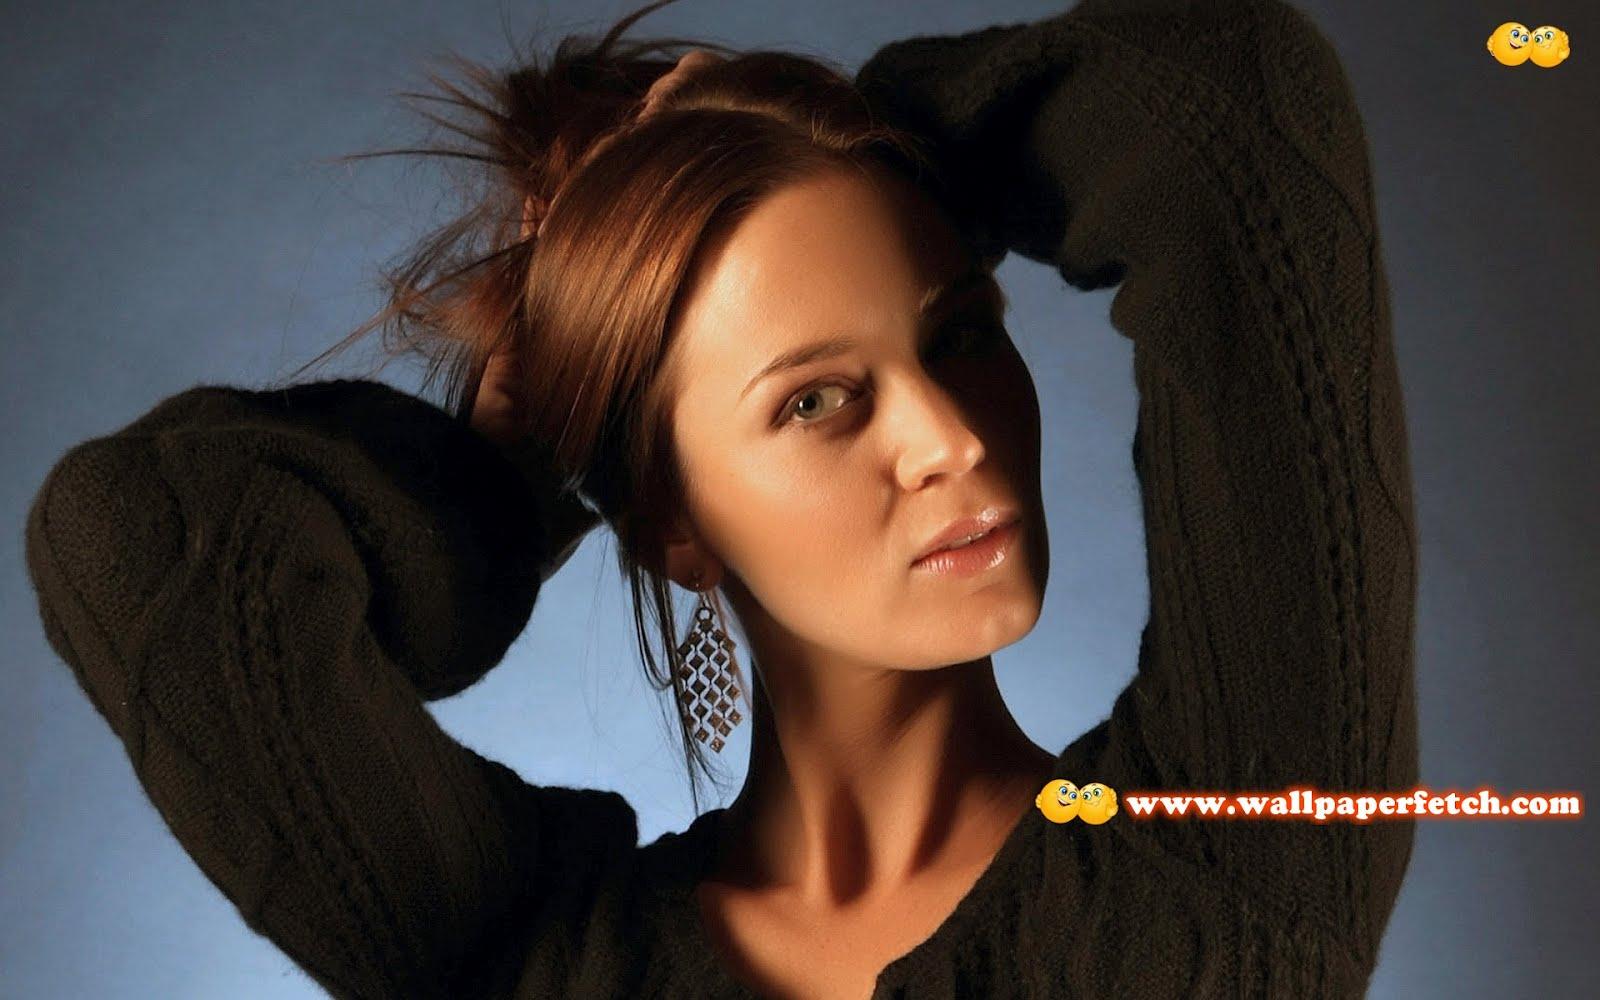 http://2.bp.blogspot.com/-zEg0mRREA7s/T1SckDcLCaI/AAAAAAAANjo/gpGzD6c0MJs/s1600/emily-blunt-11108-1920x1200.jpg